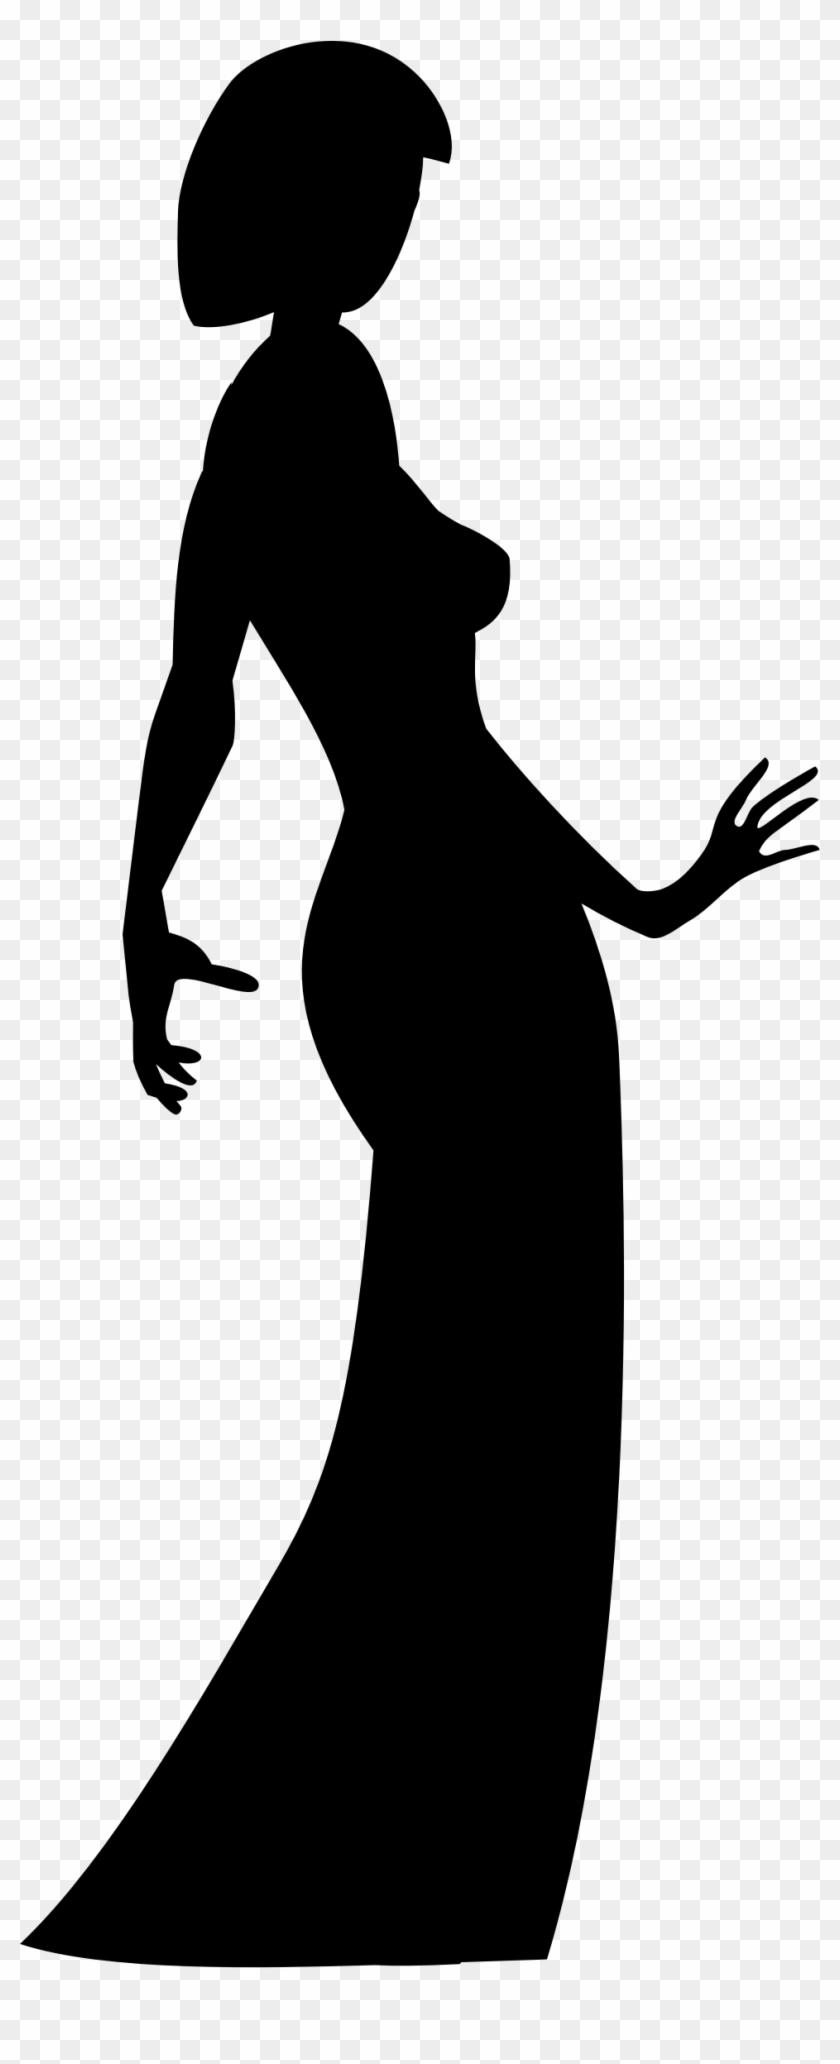 Big Image - Woman Shadow Png Dress - Free Transparent PNG